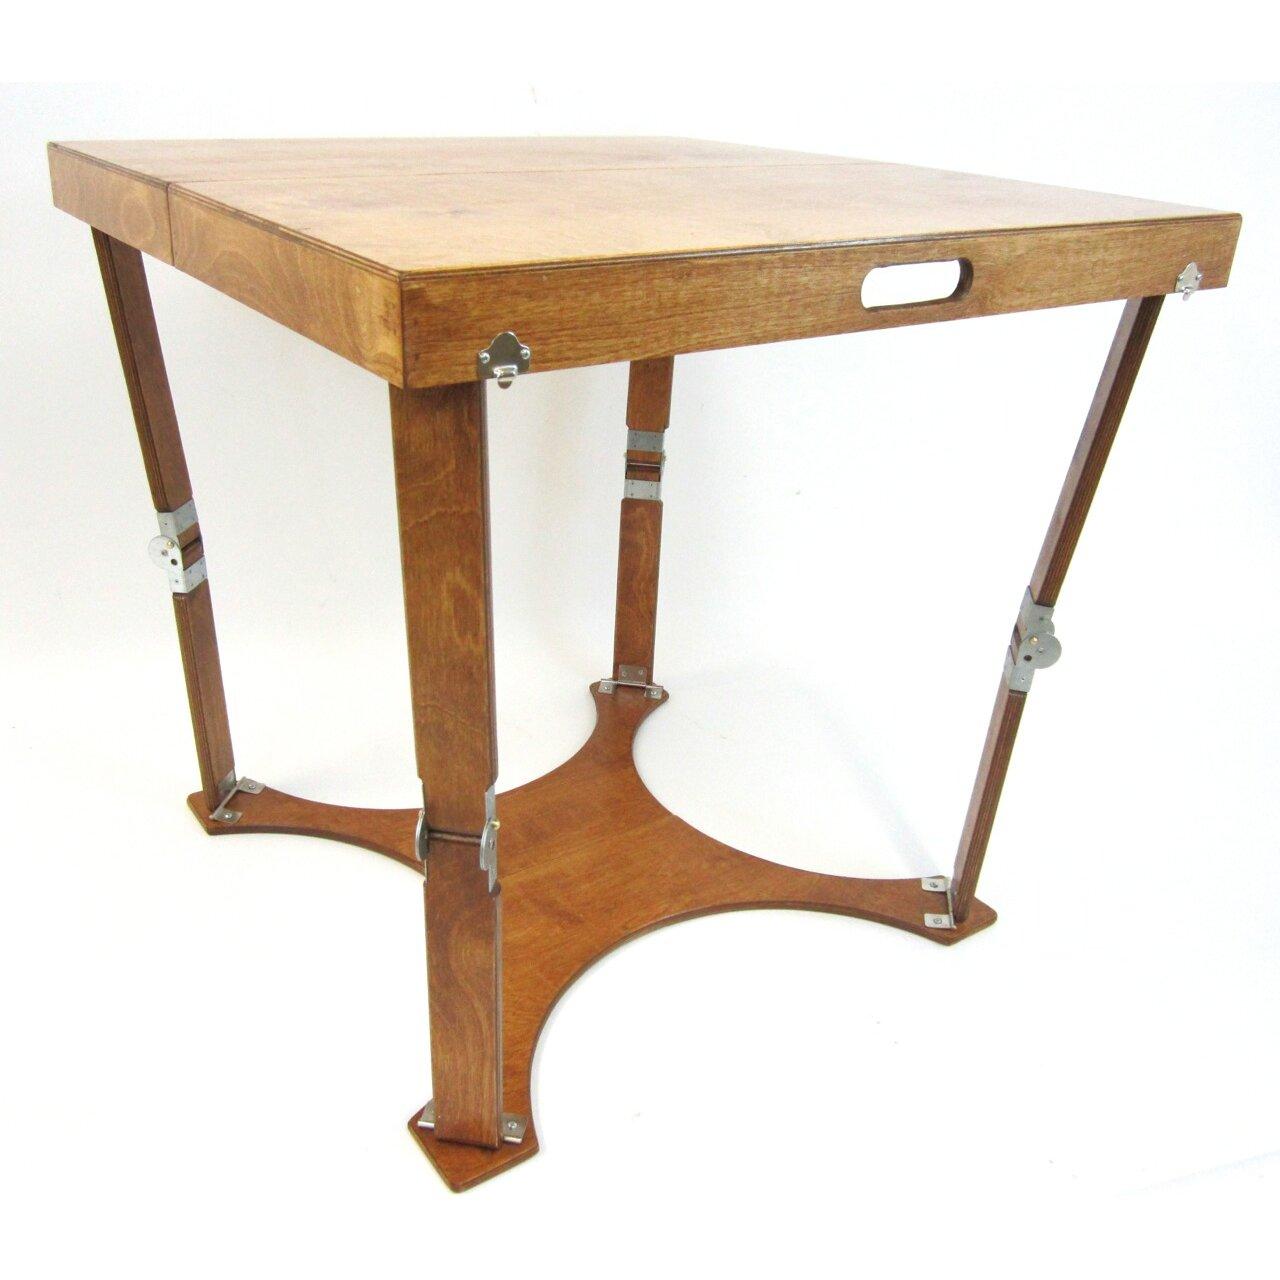 spiderlegs portable folding dining table  reviews  wayfair, Dining tables